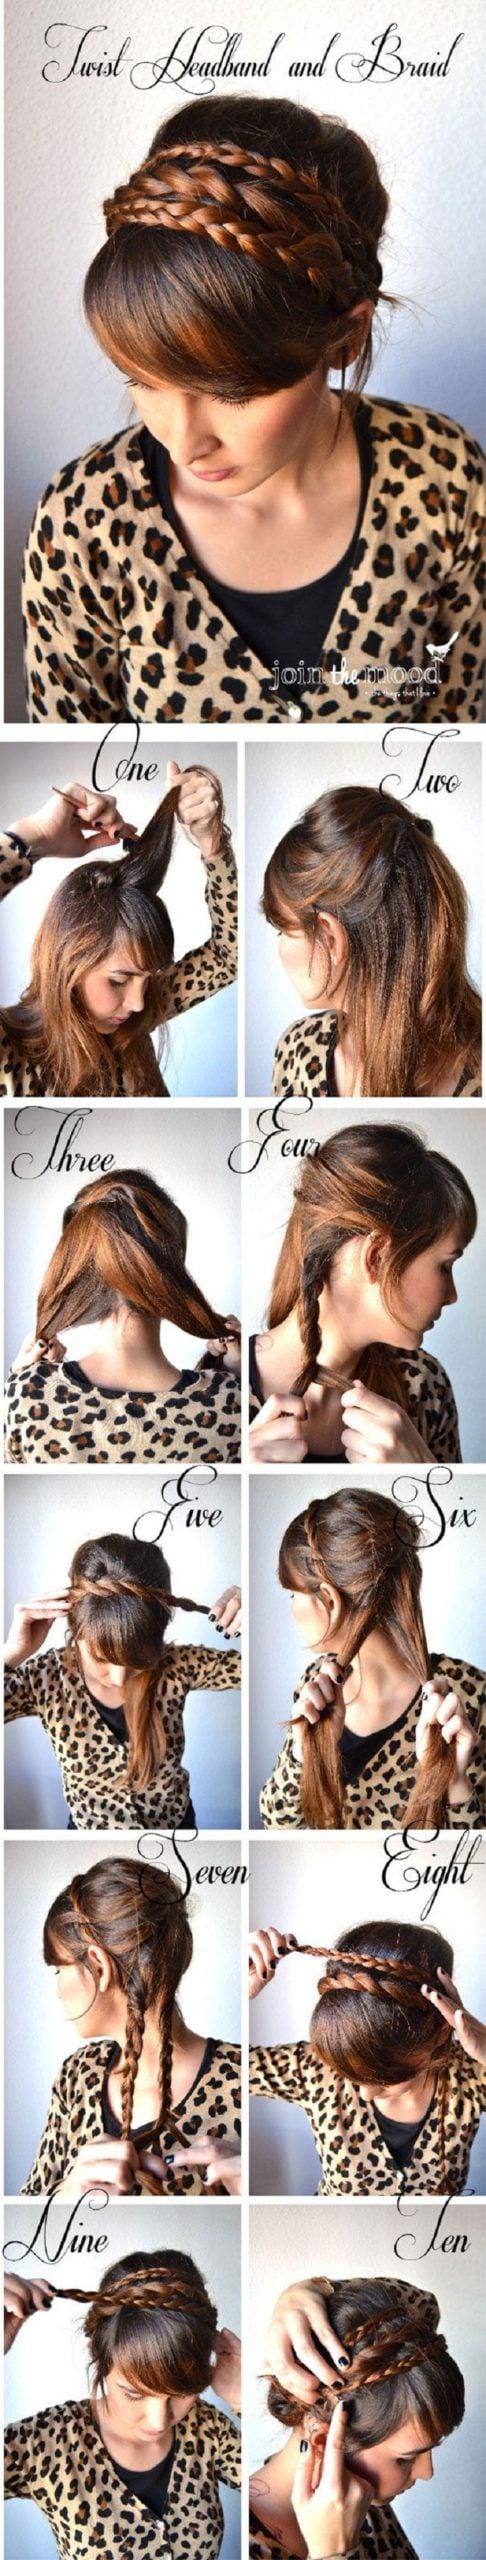 Девушки с двумя косами